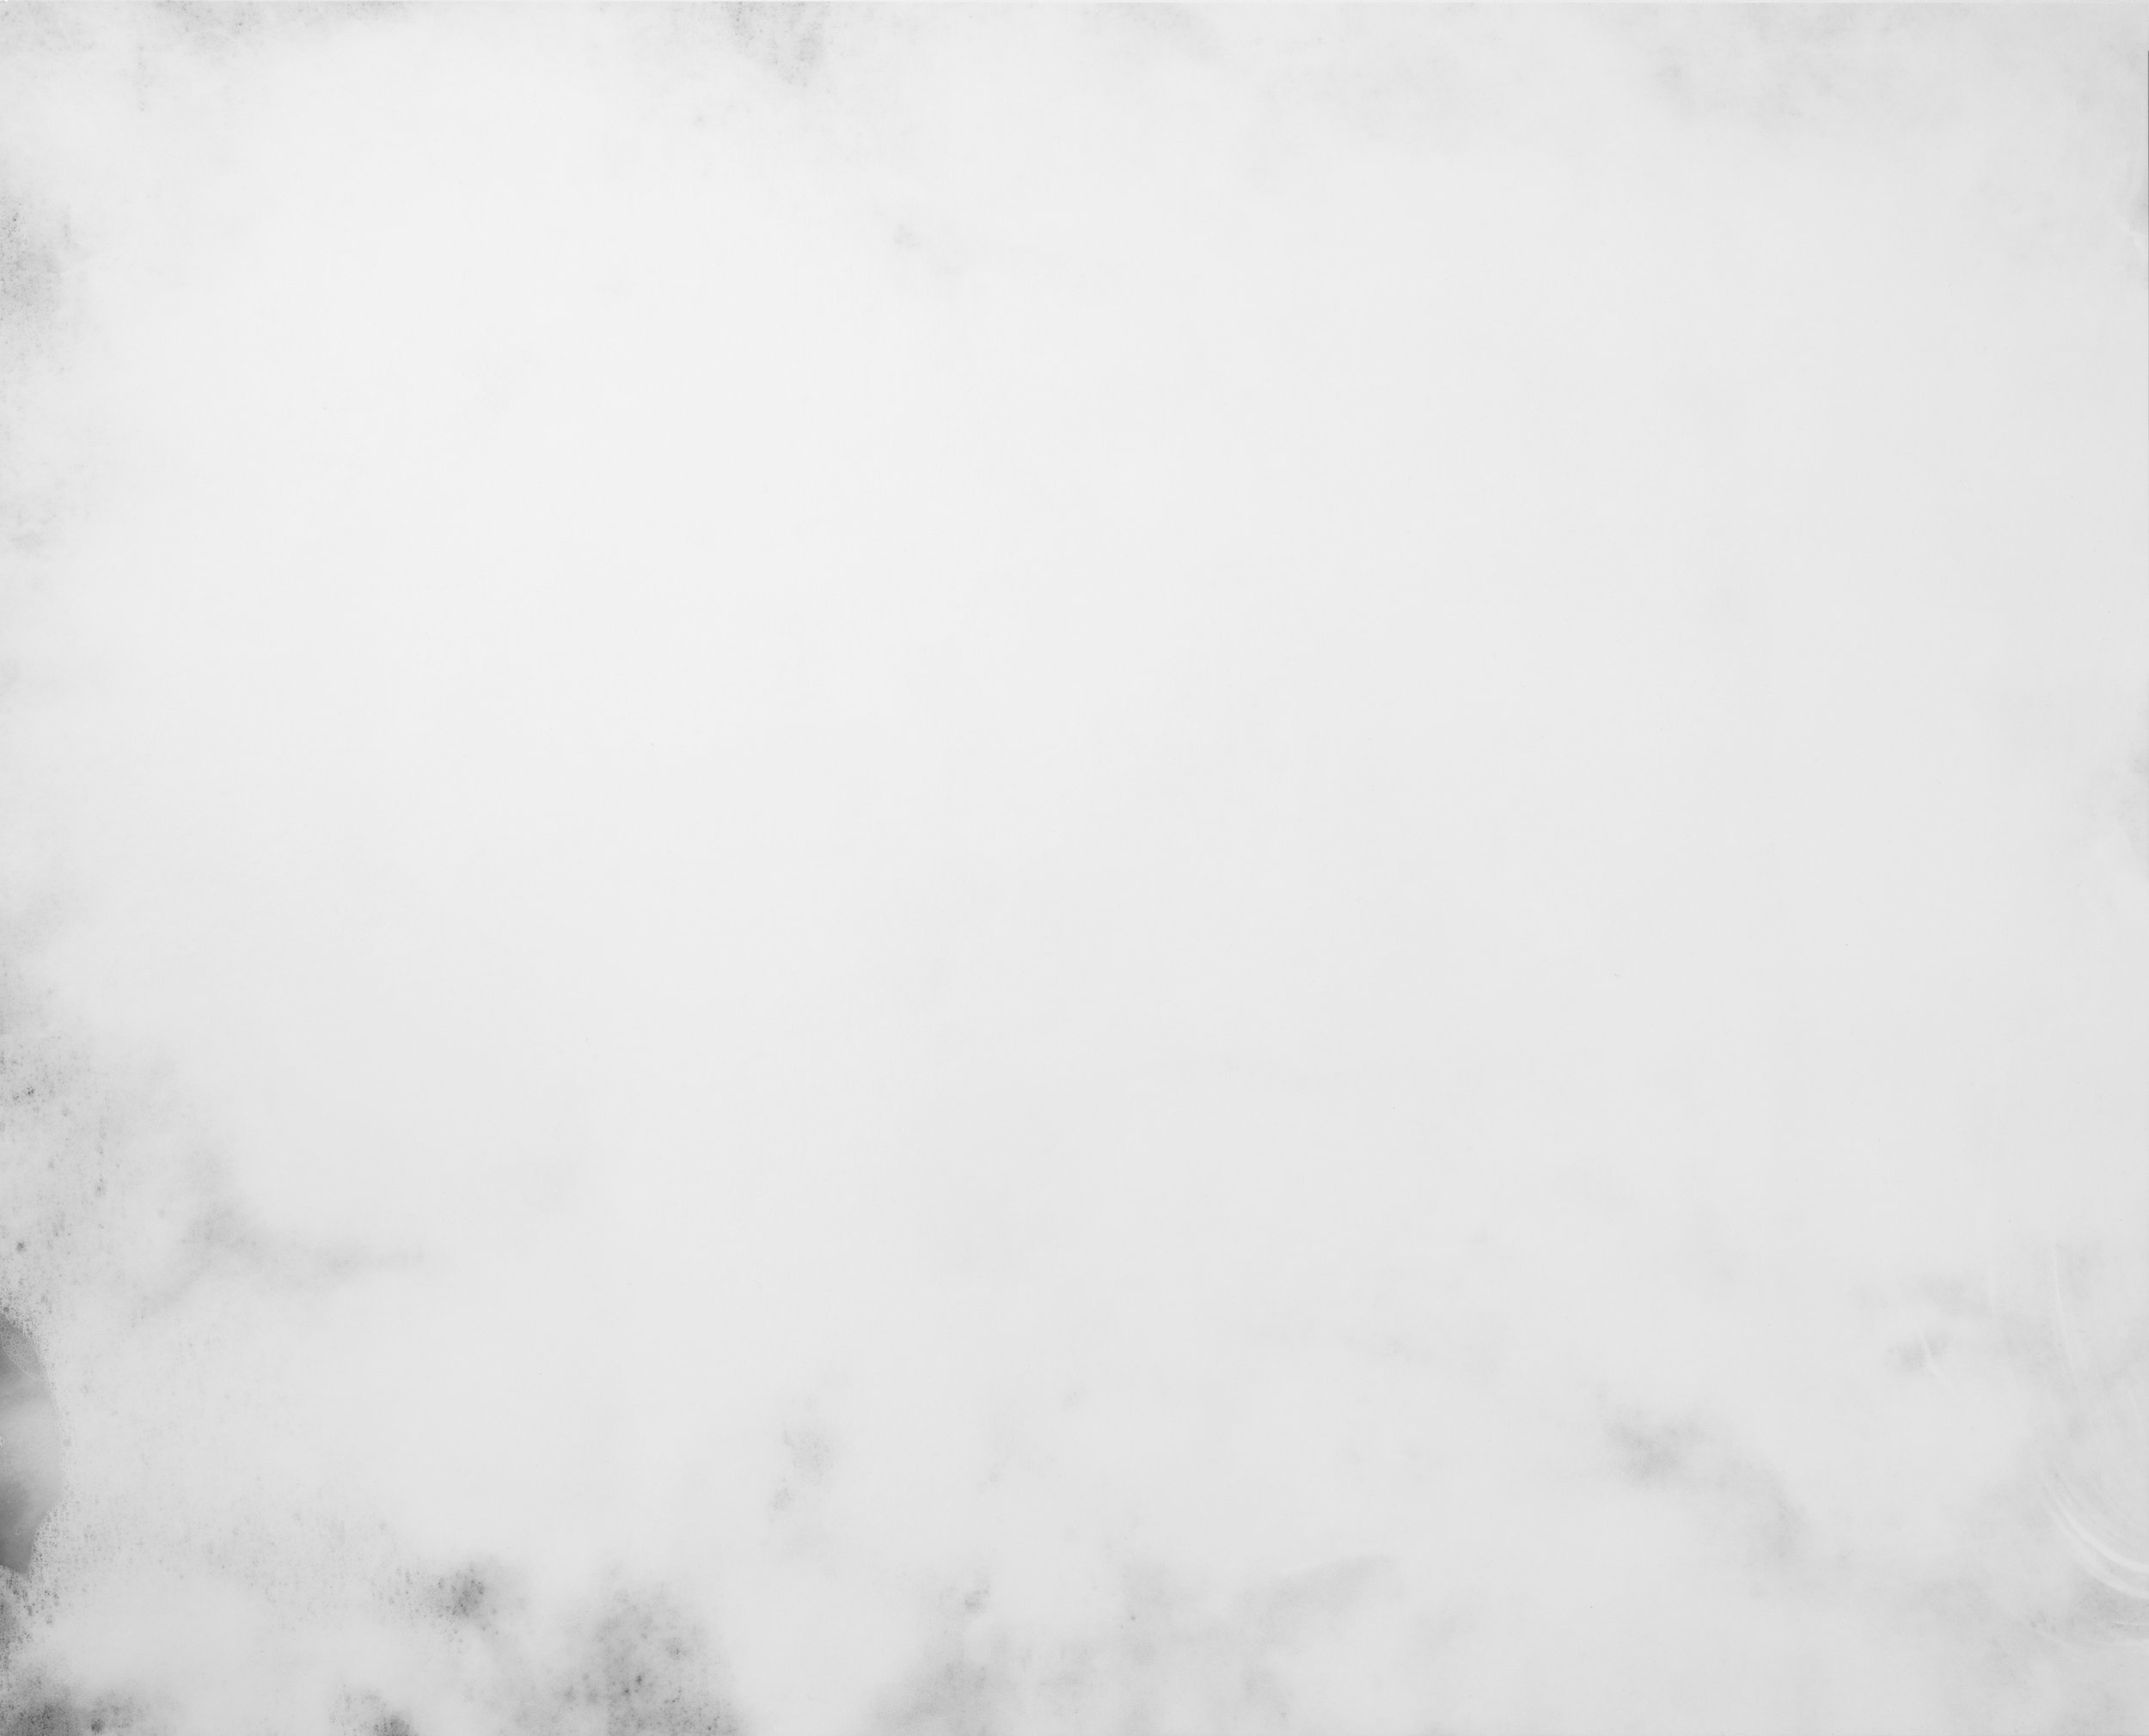 Equivalent I , 2019  Unique silver gelatin fiber print  37 ½ x 30 ¼ inches